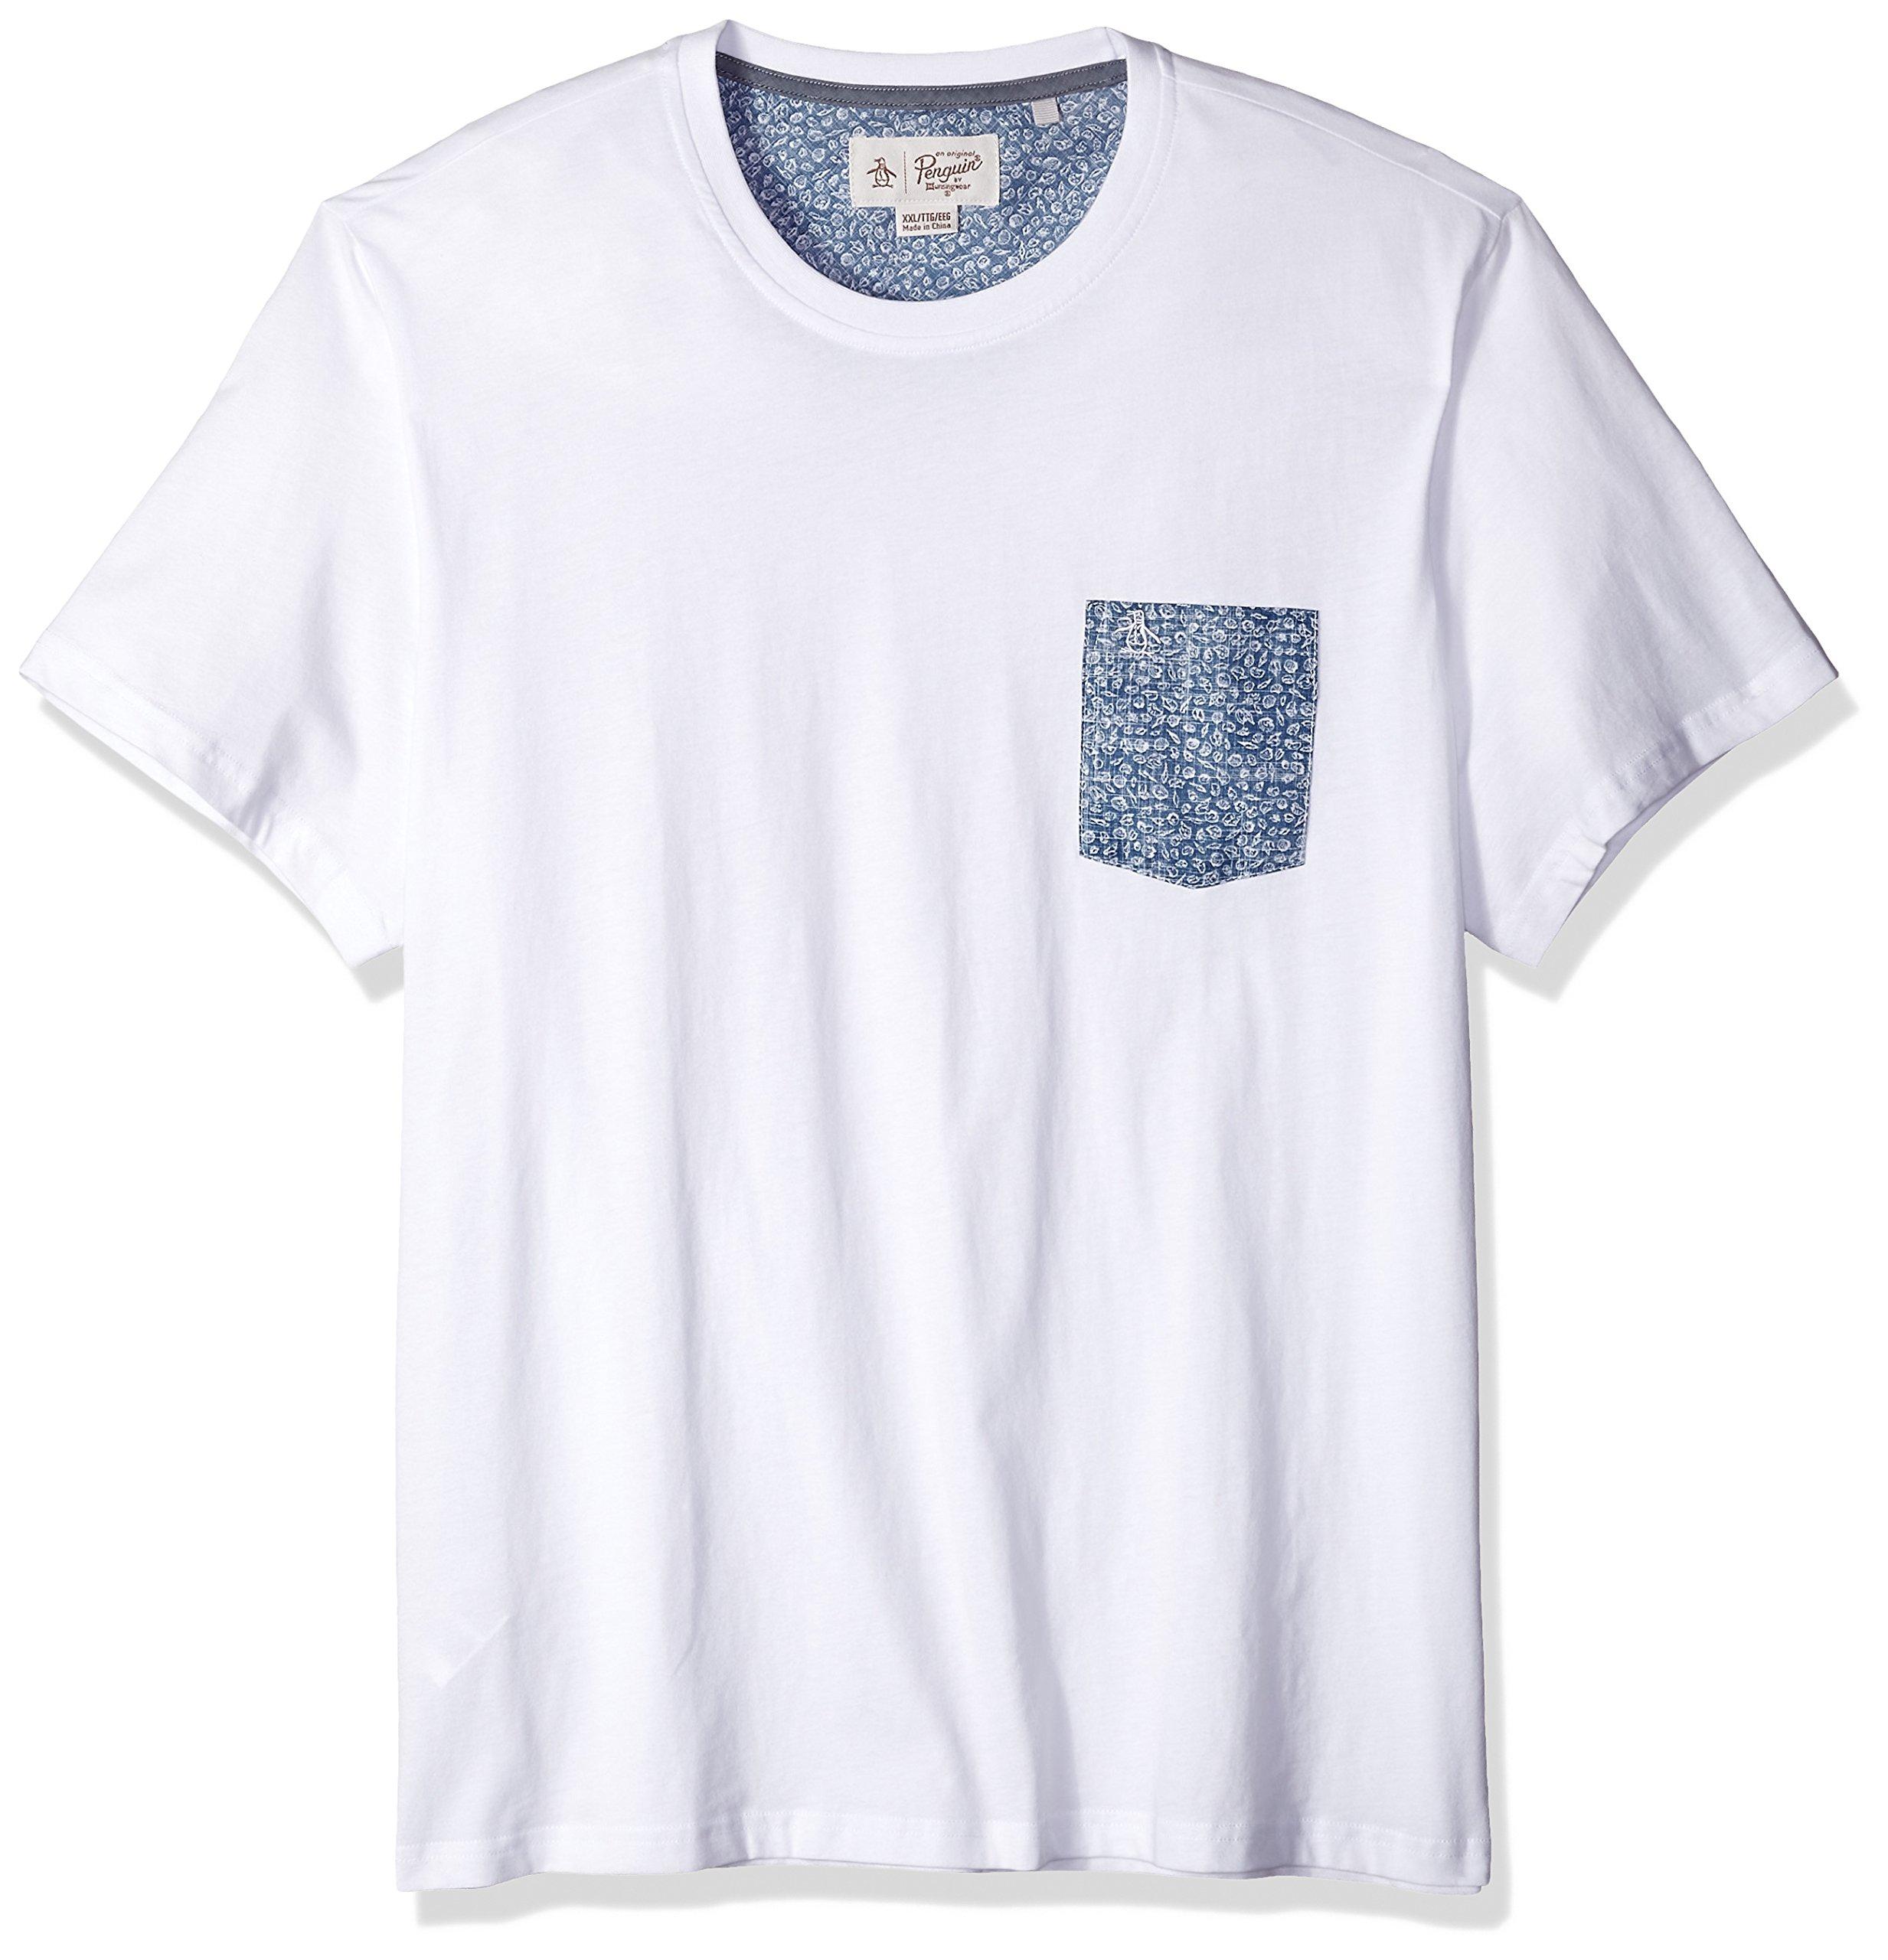 Original Penguin Men's Short Sleeve Shell Print Pocket Tee, Bright White, Extra Large